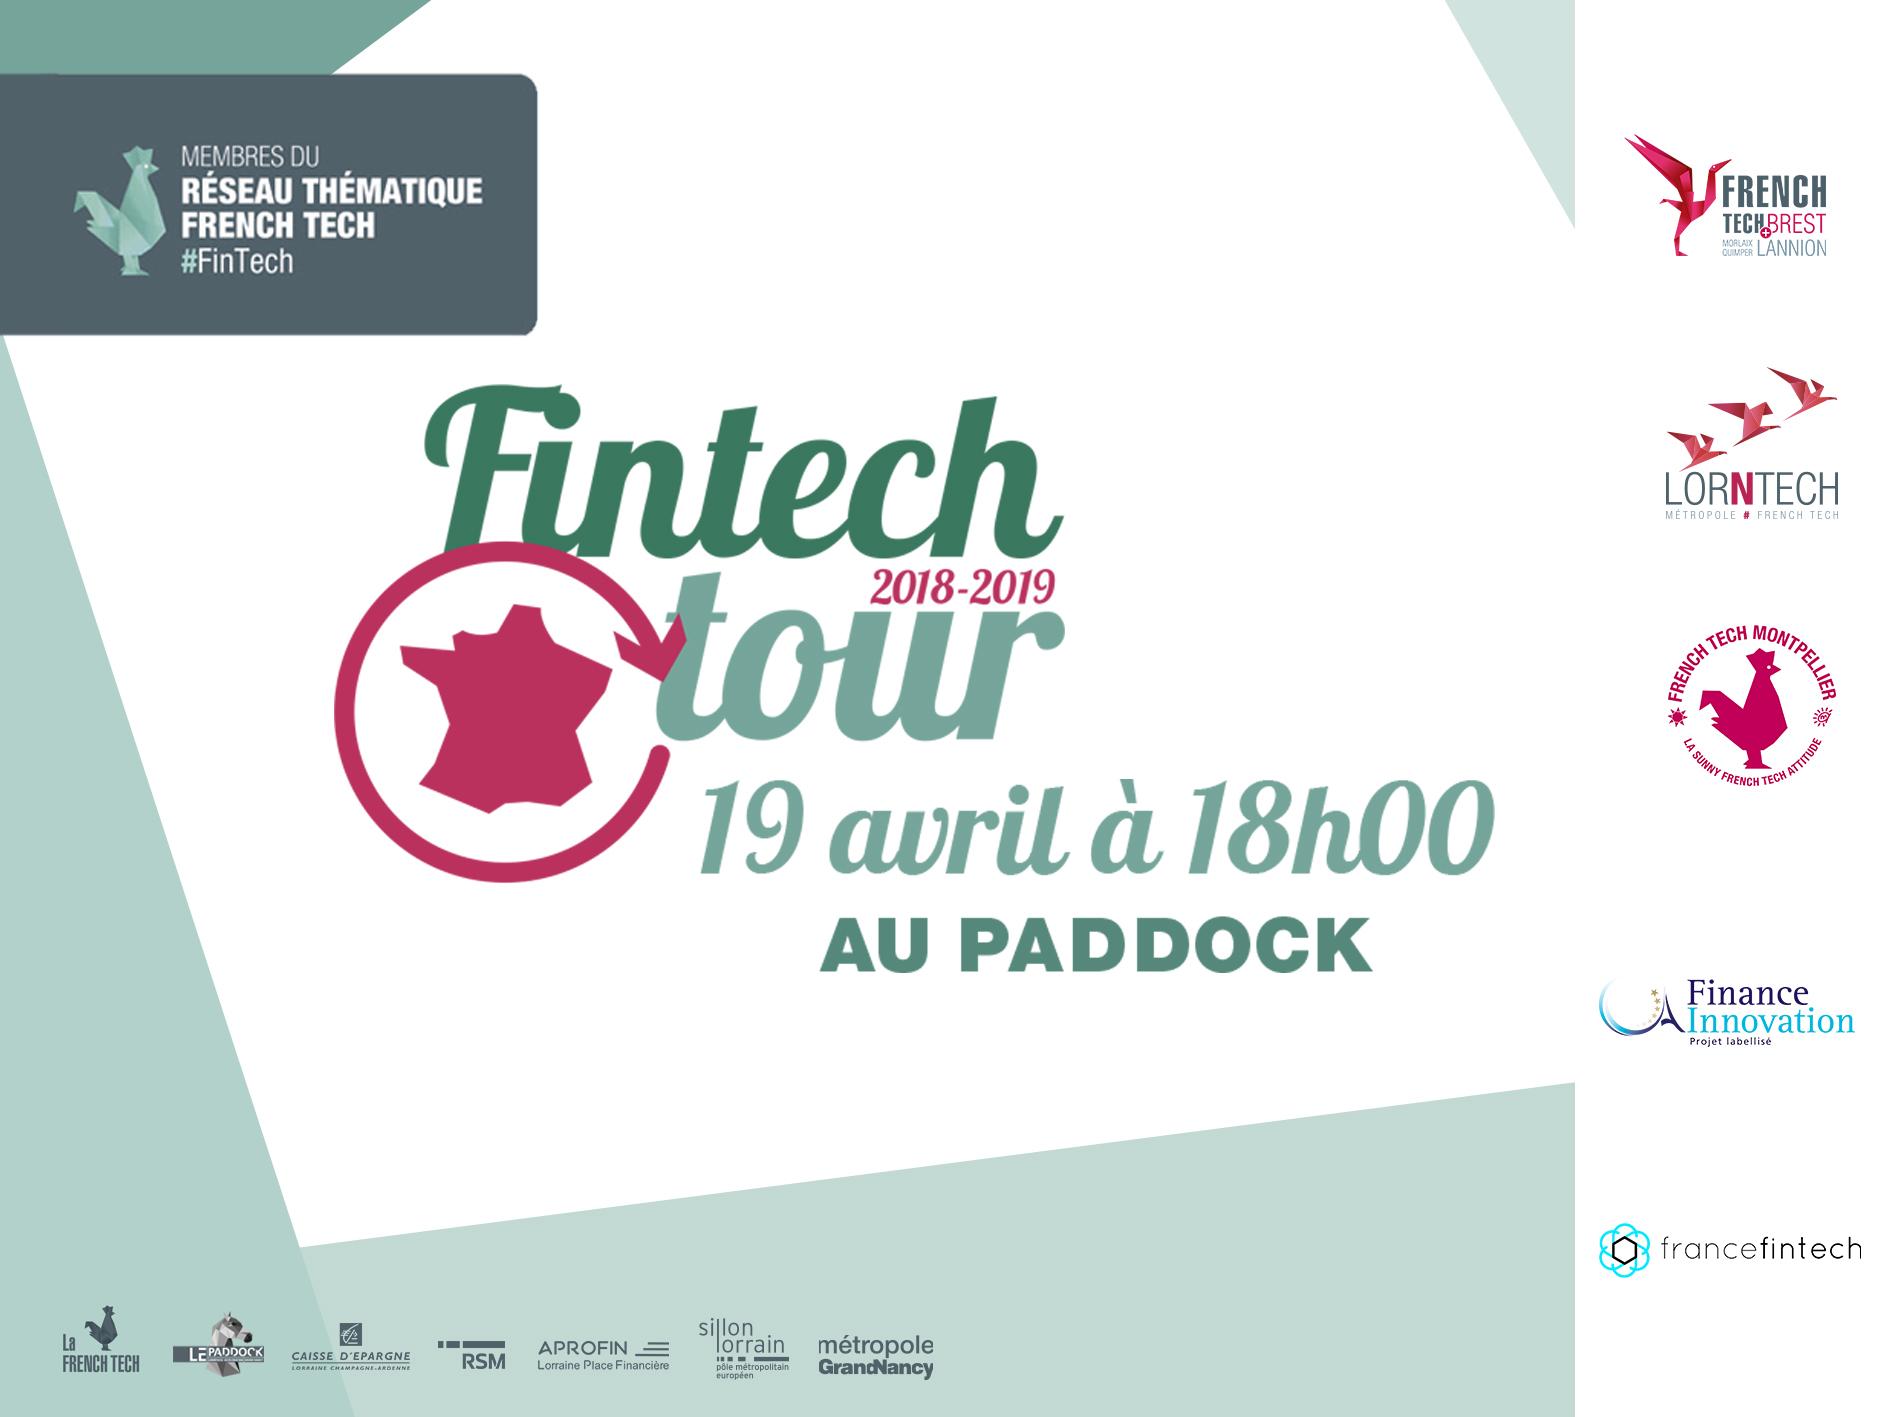 FinTech French Tech